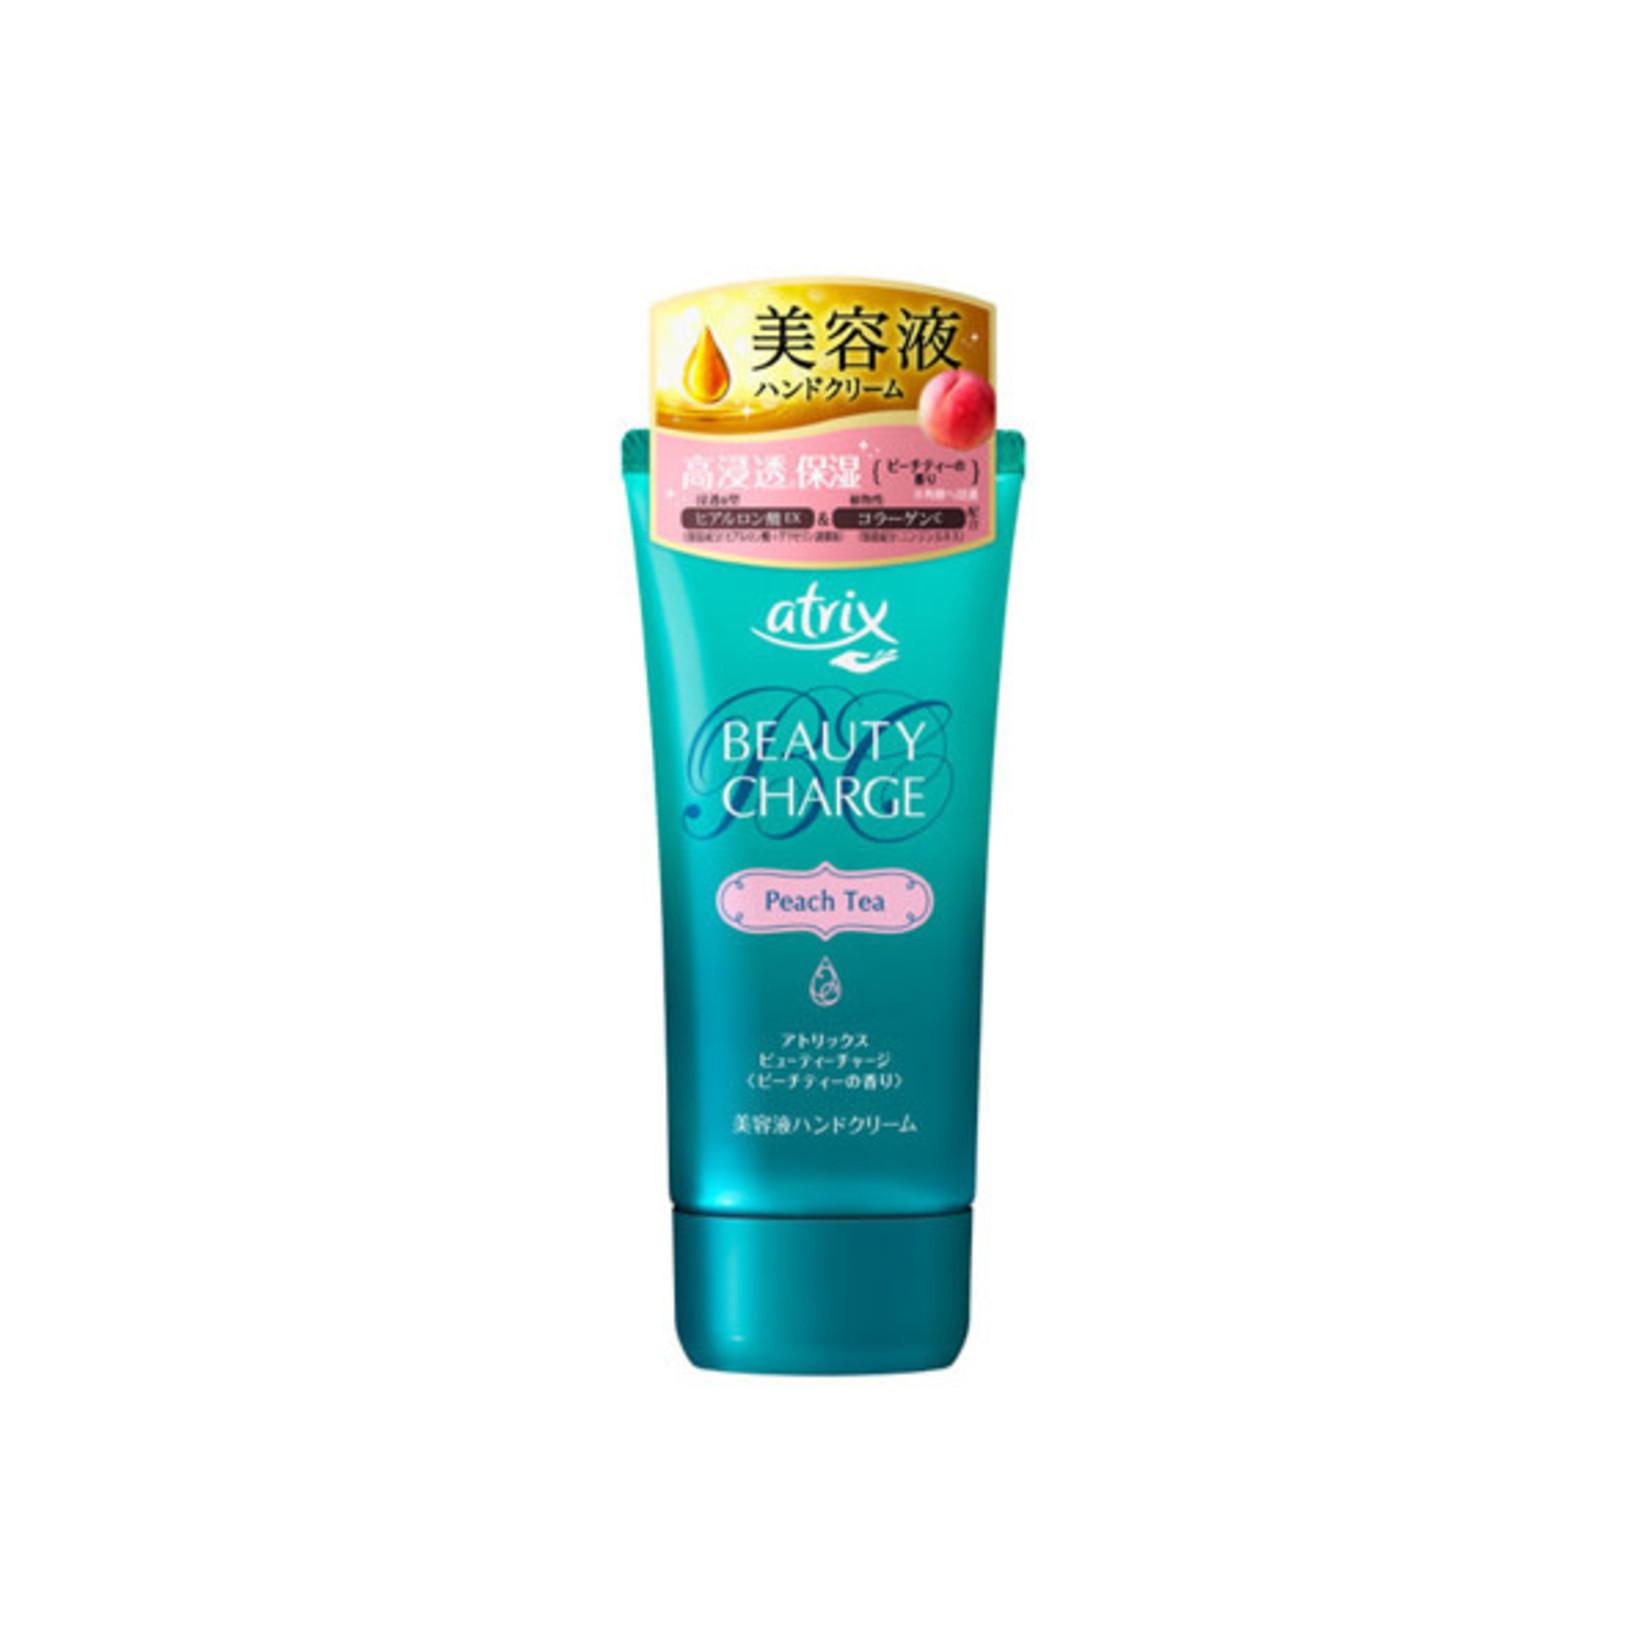 Atrix Atrix Beauty Charge Hand Cream - Peach Tea